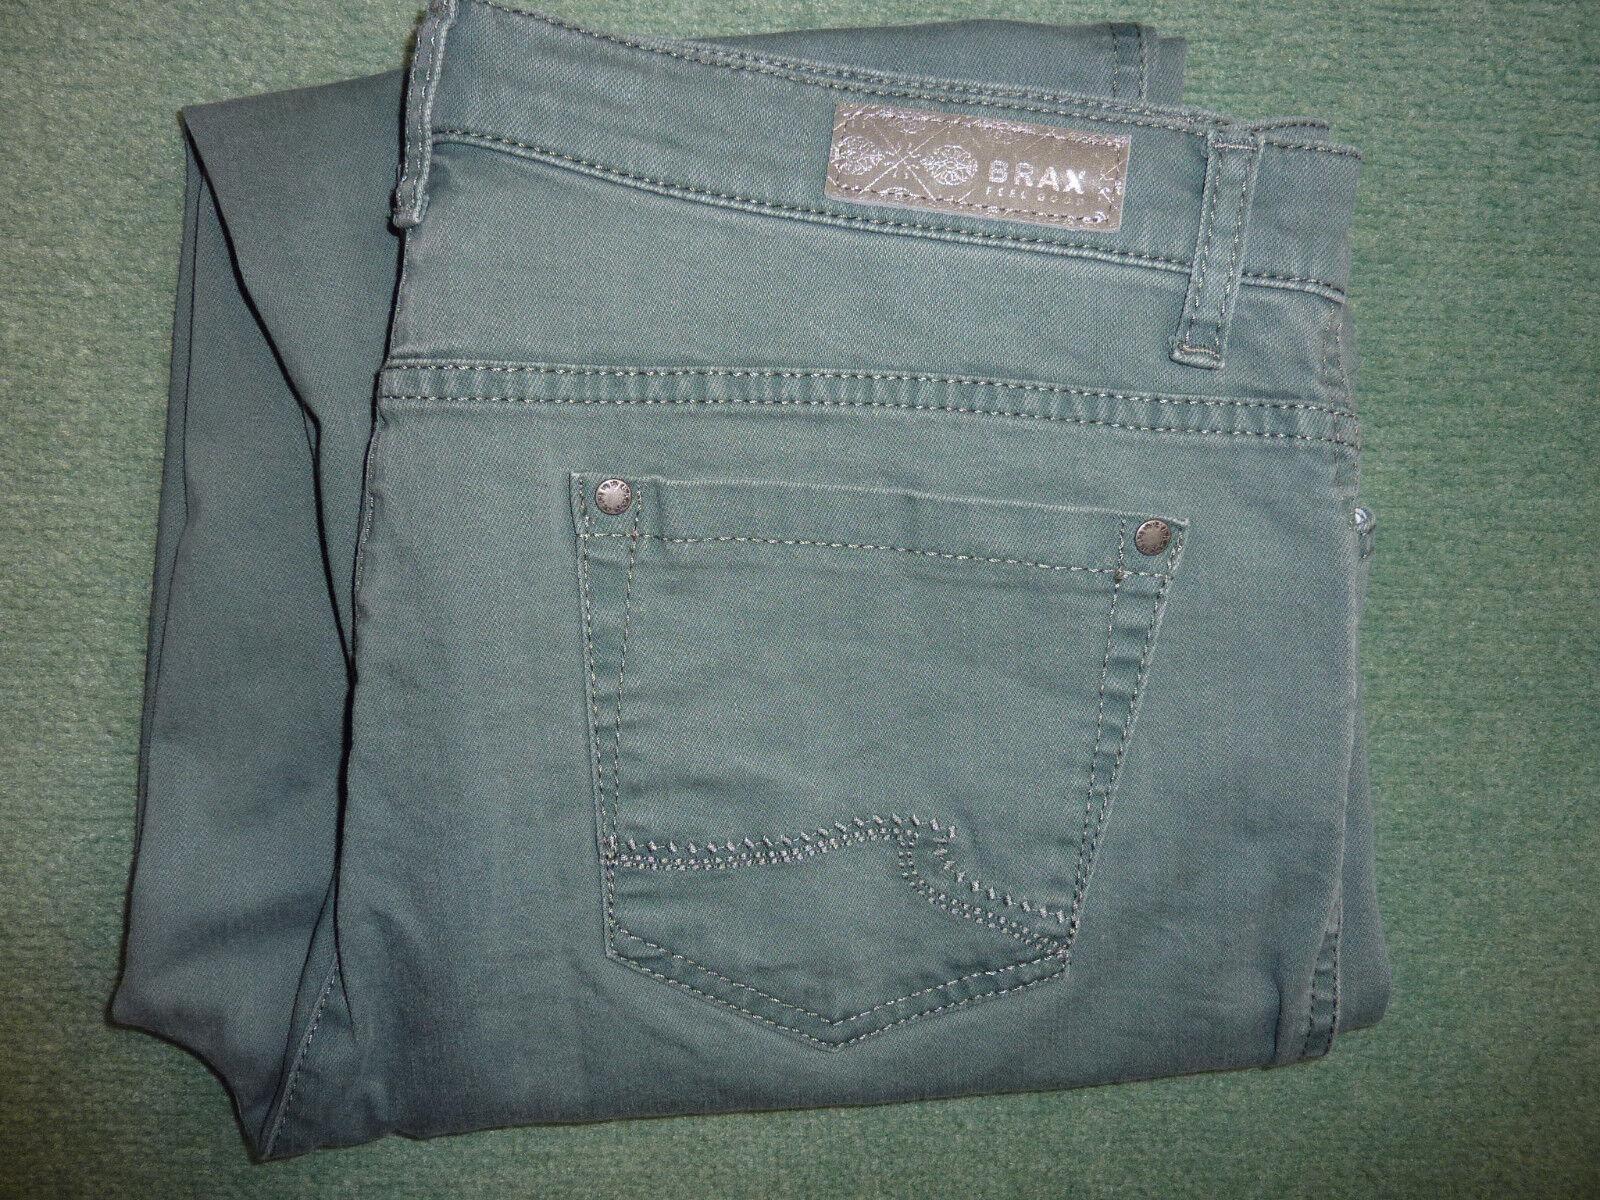 Hight Waist Jeans BRAX Nicola Carola Peter Hahn grün denim Gr. 44 L